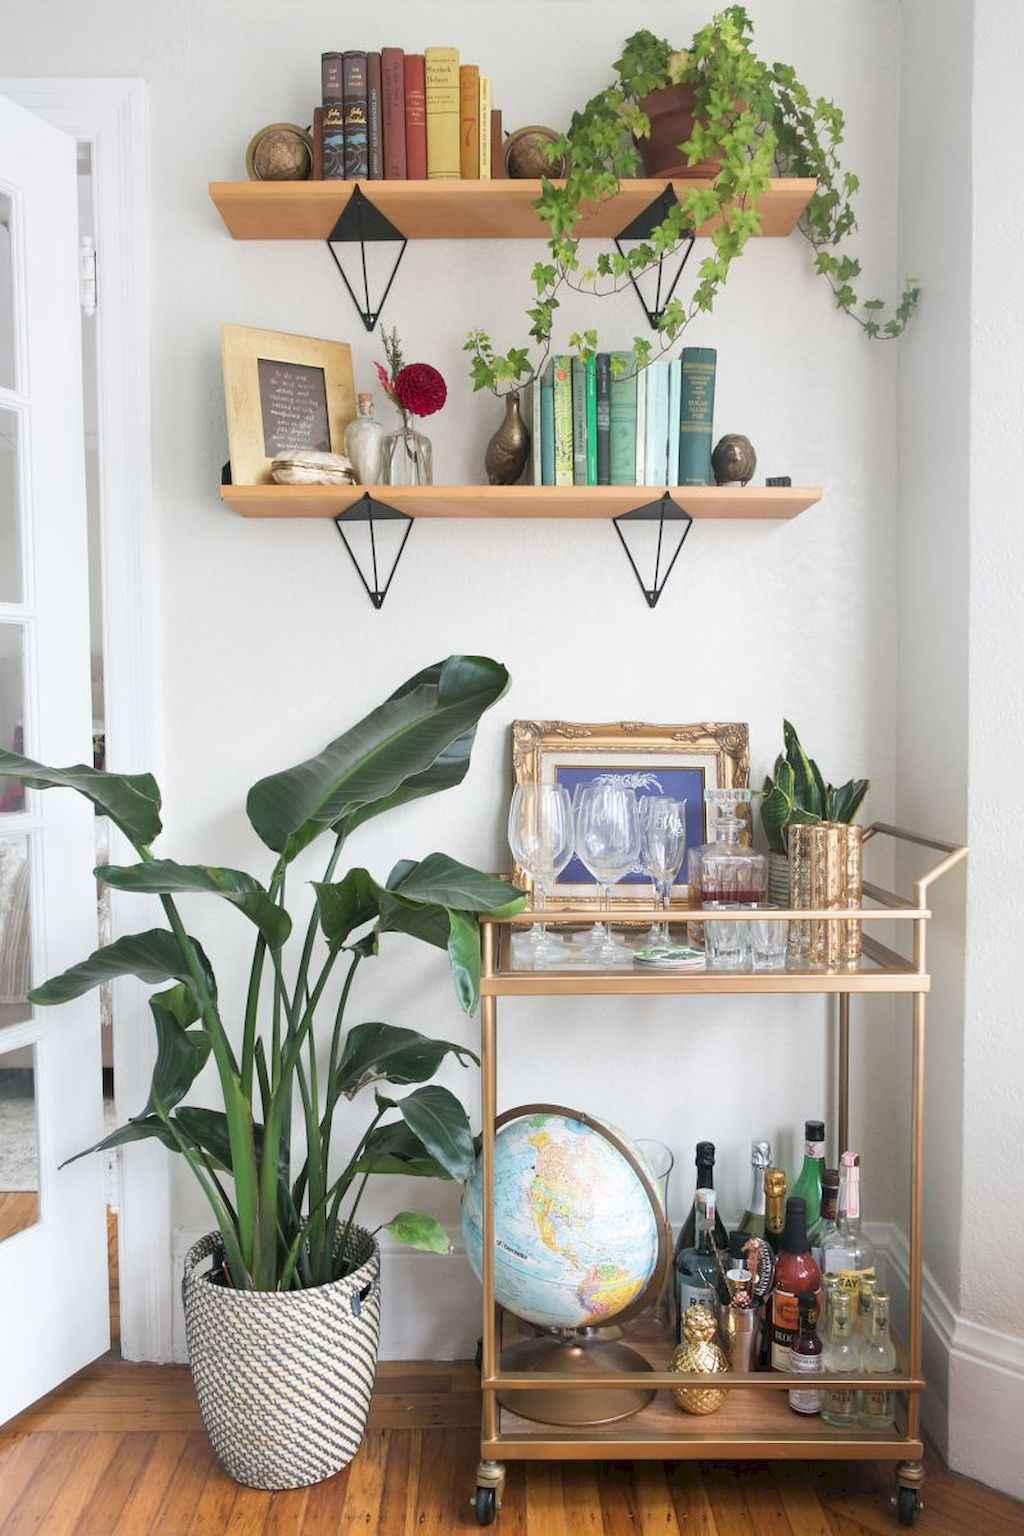 Small apartment decorating ideas (21)